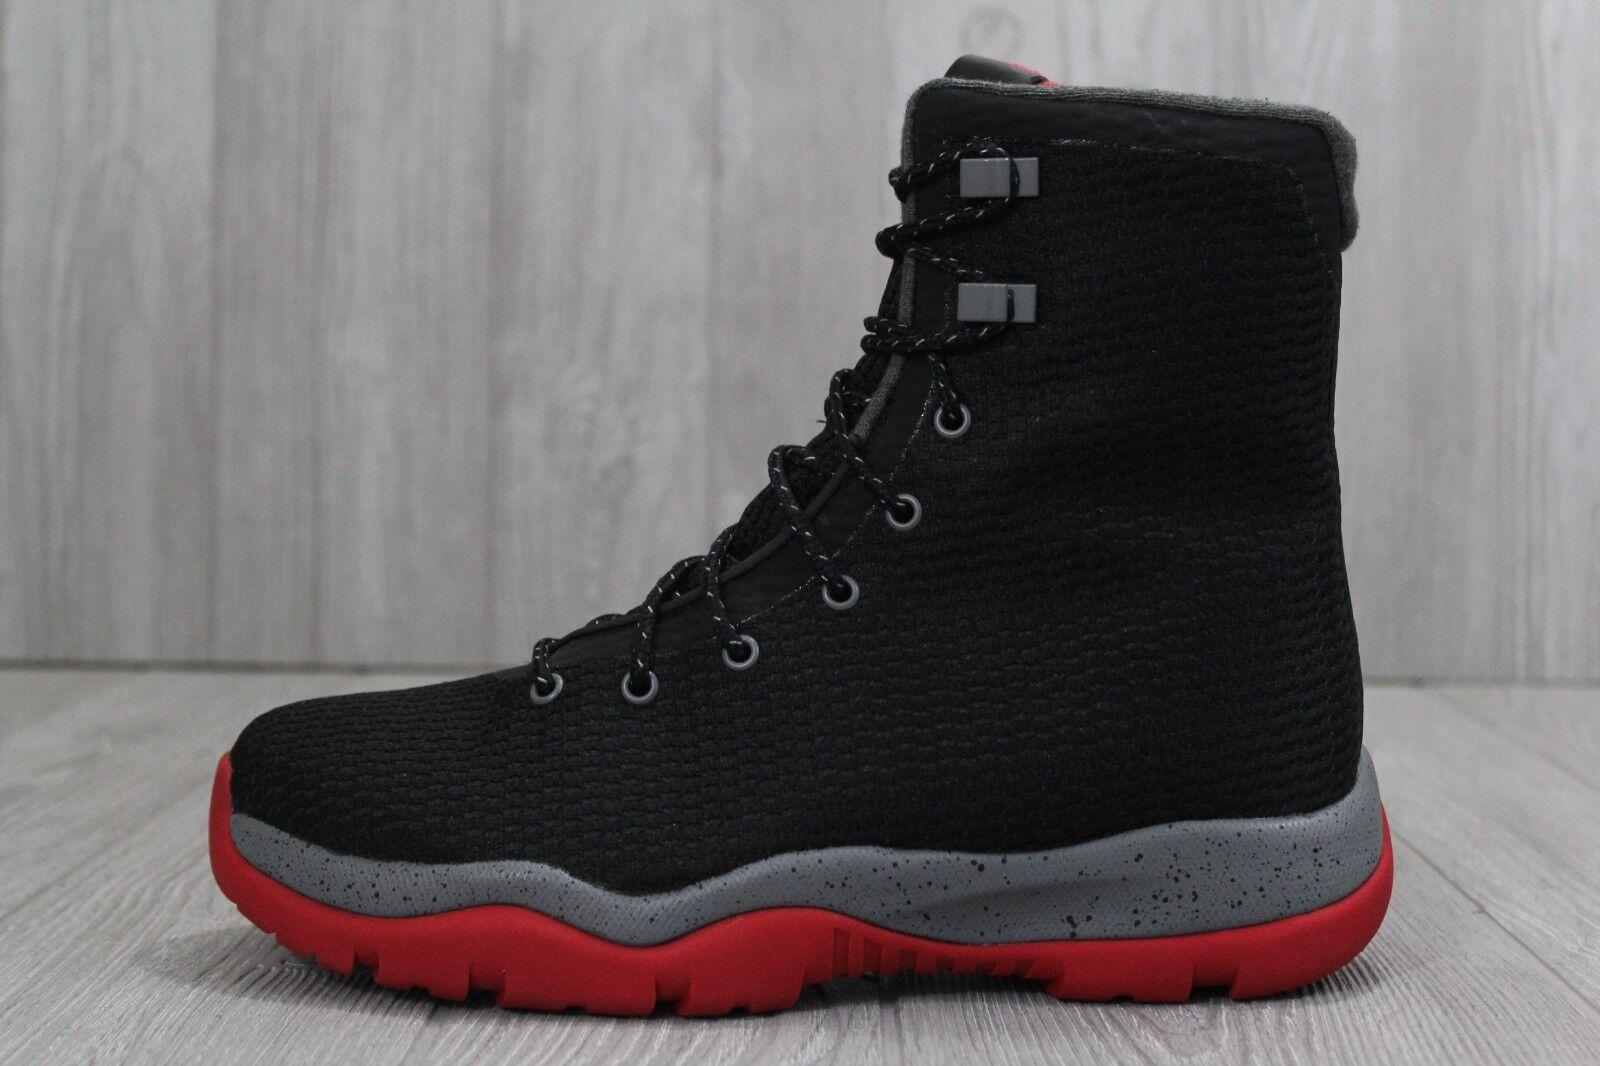 promo code 1200a efc1b 32 32 32 Nuove Nike Air Jordan Futuro Stivali Sneakerboots Allevati Nero  854554 001 Uomo 8 164352